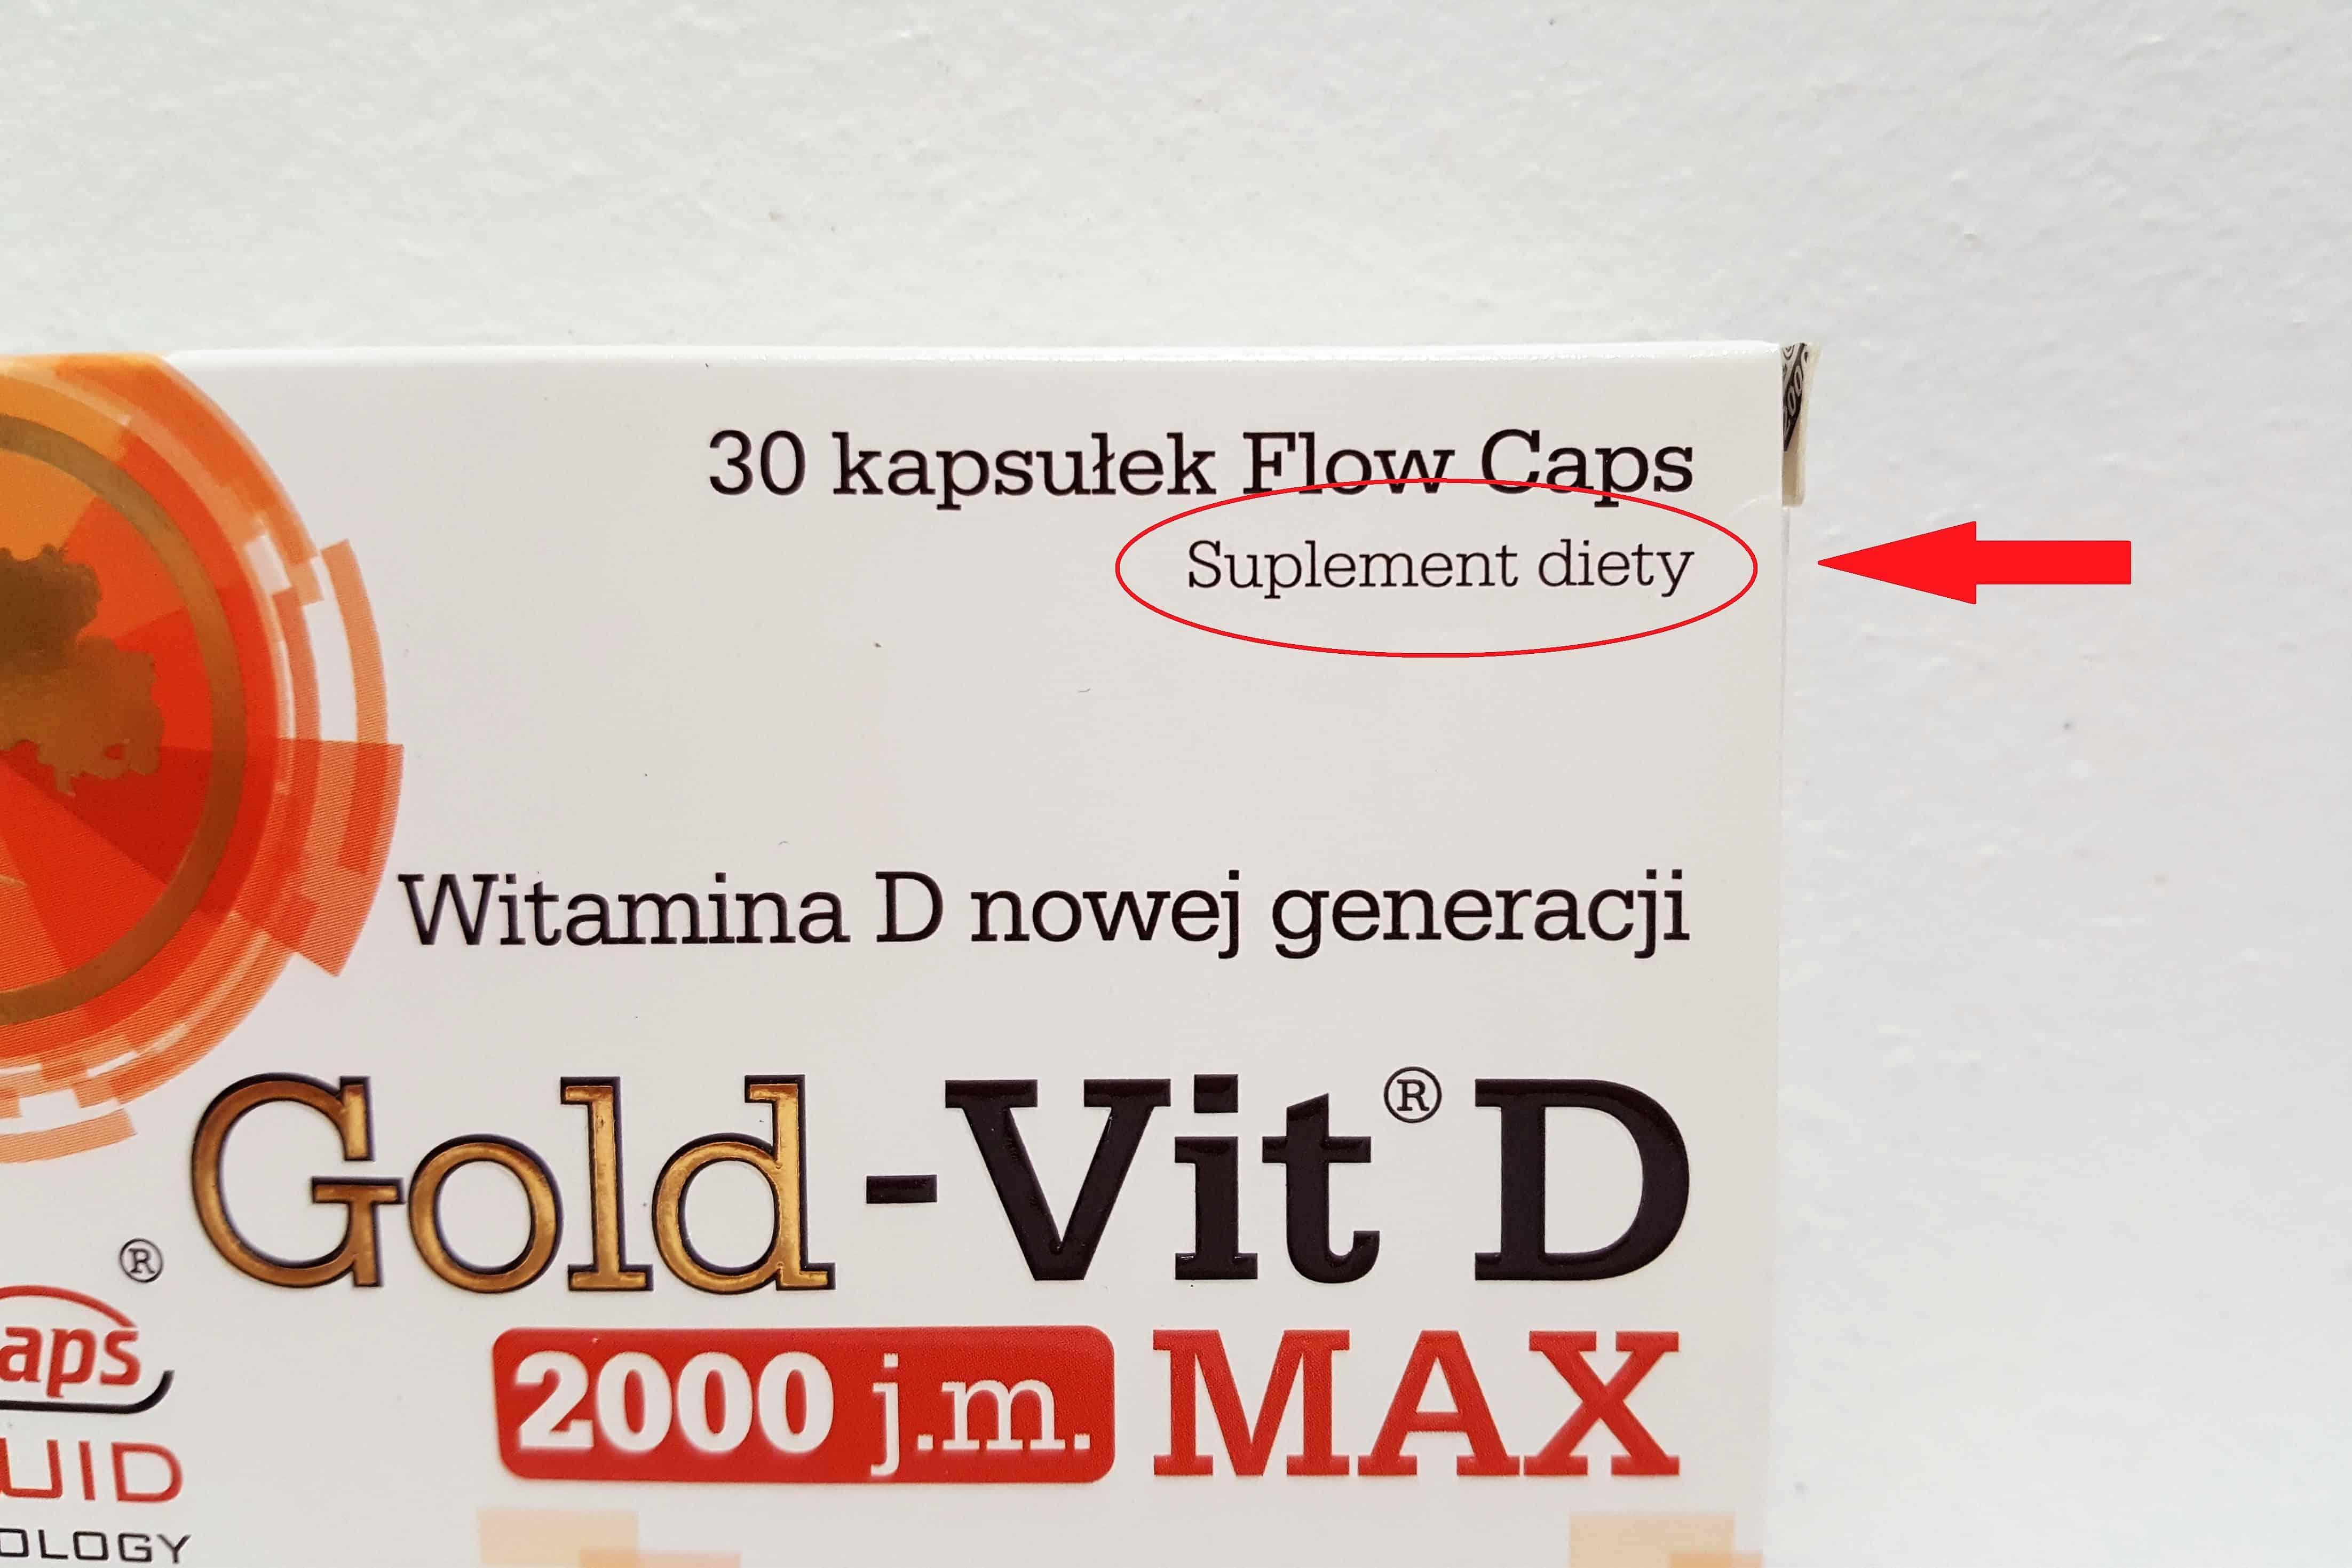 suplement diety Olimp Gold-Vit D Max2000 j.m. Matka Aptekarka